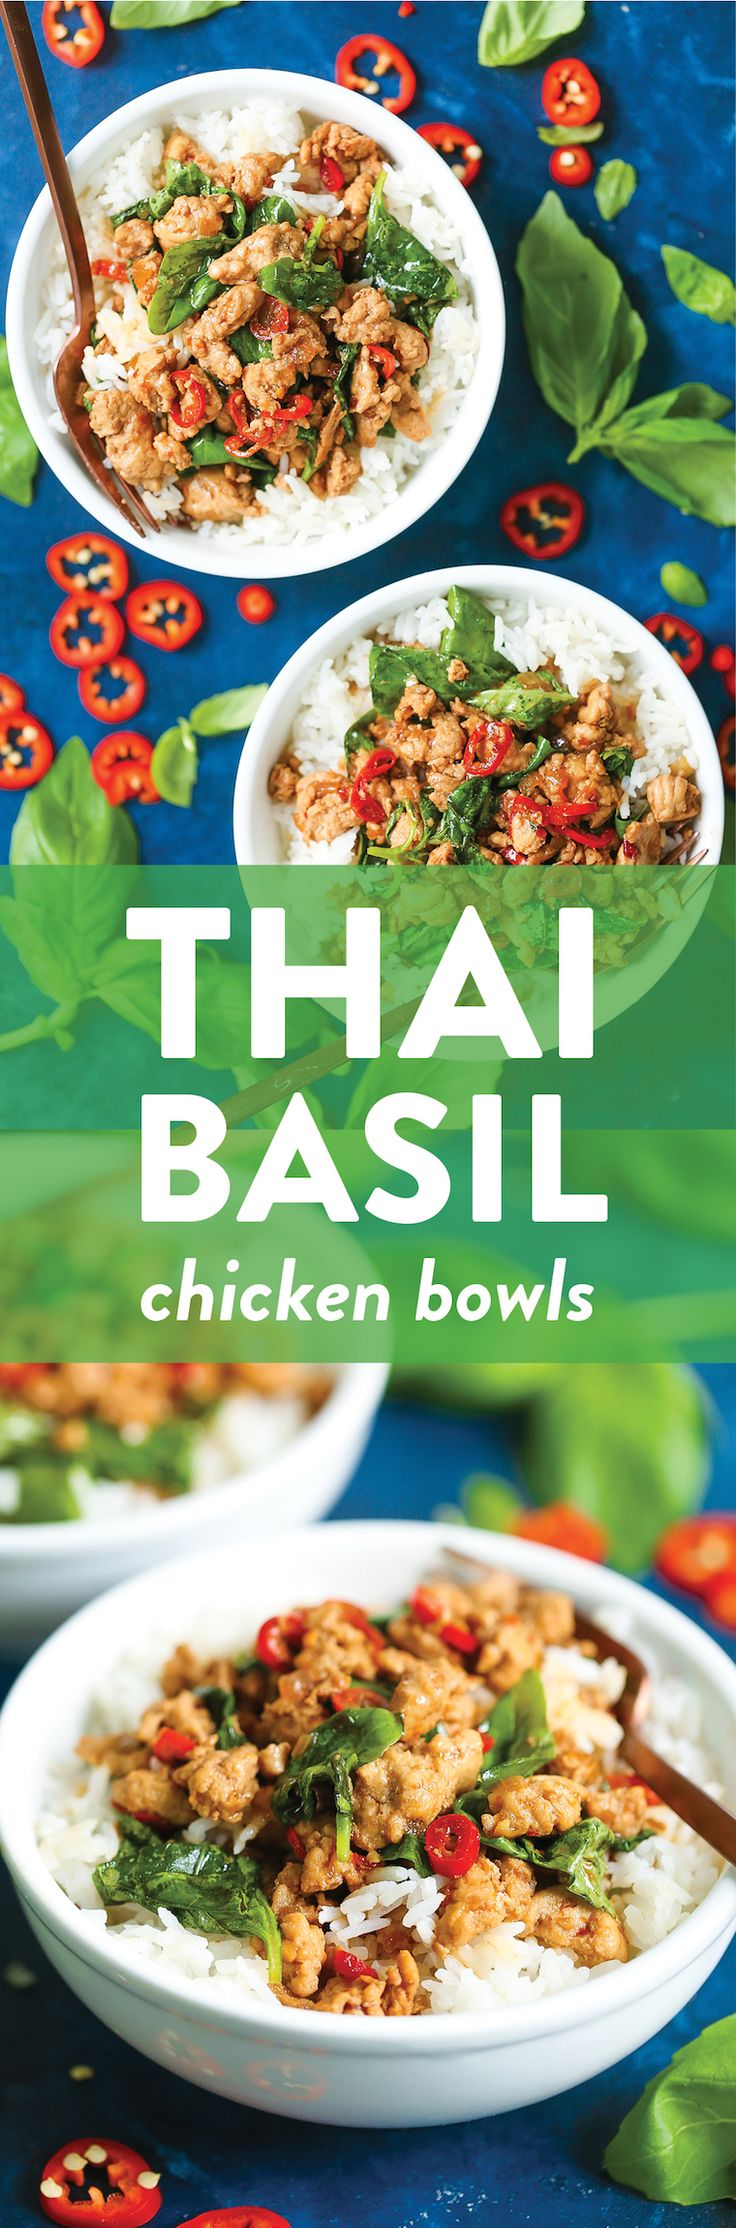 Thai Basil Chicken Bowls